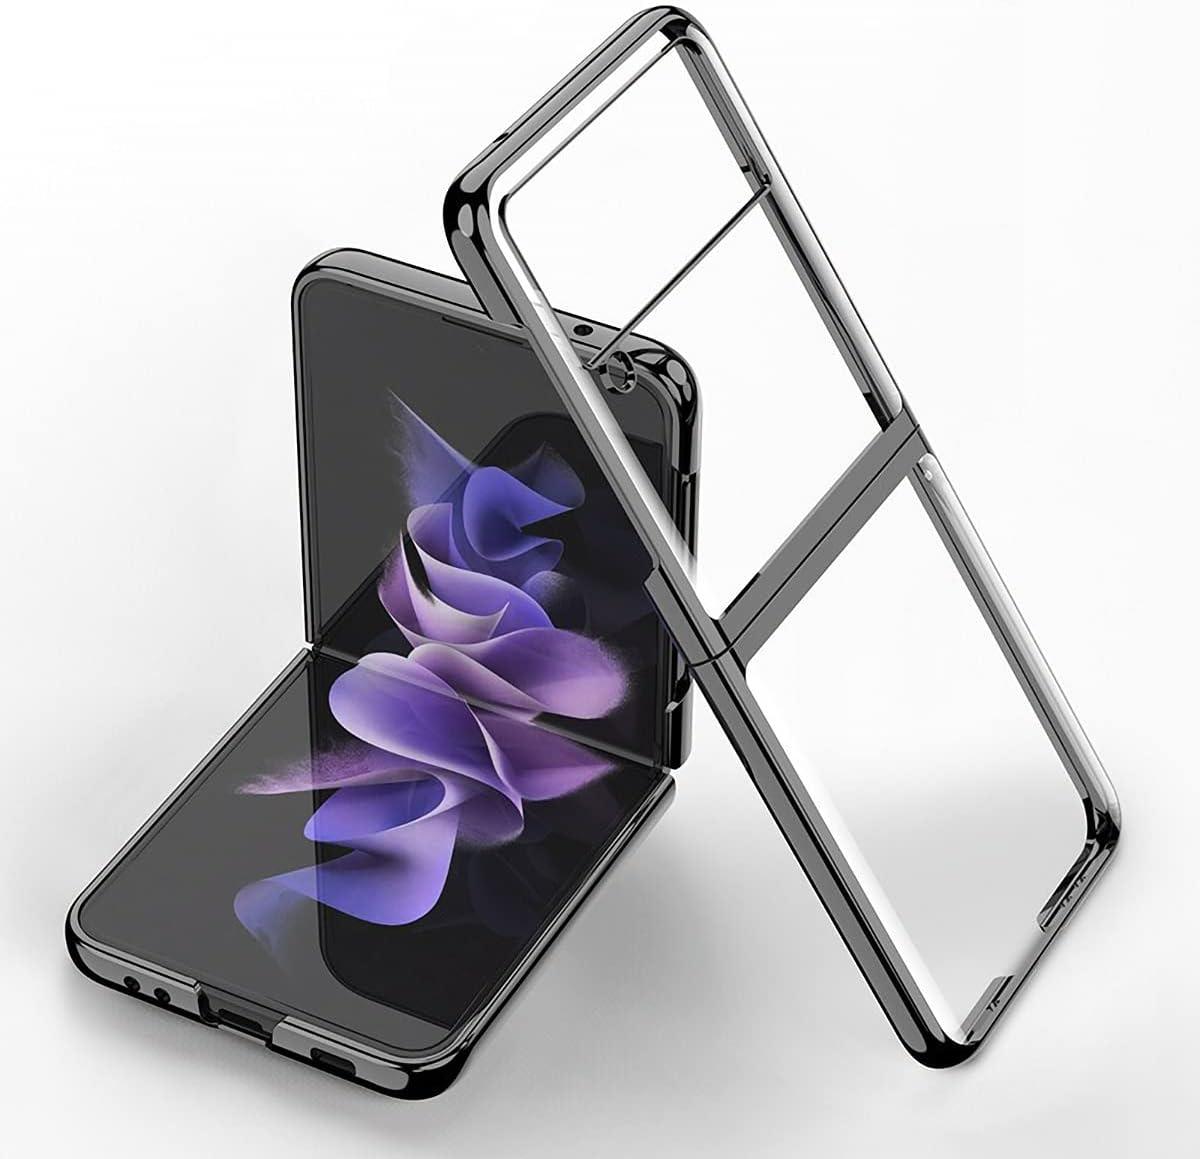 FUTURECASE Z Flip 3 Case, Galaxy Z Flip 3 Case, Samsung z Flip 3 Case, Clear Crystal Transparent Plating Case for Samsung Galaxy z Flip 3 5G ZFlip 3 ZFlip3 Z Flip3 Coque Funda Phone Cover(Black)